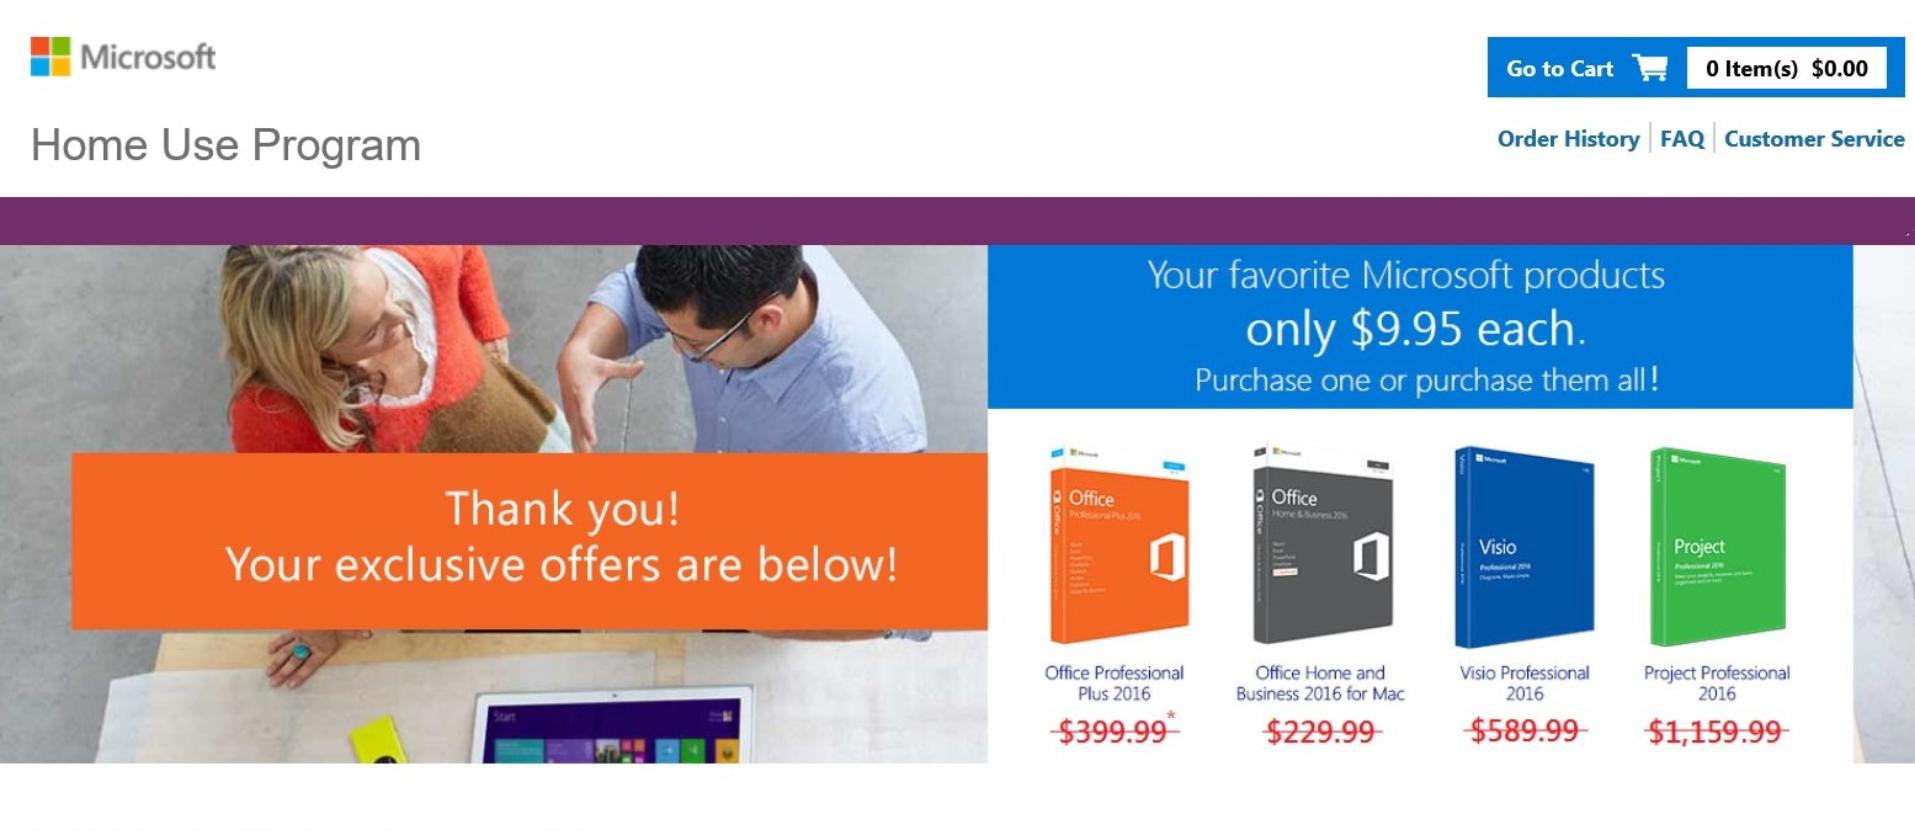 Microsoft Home Use Program – Washington State DES